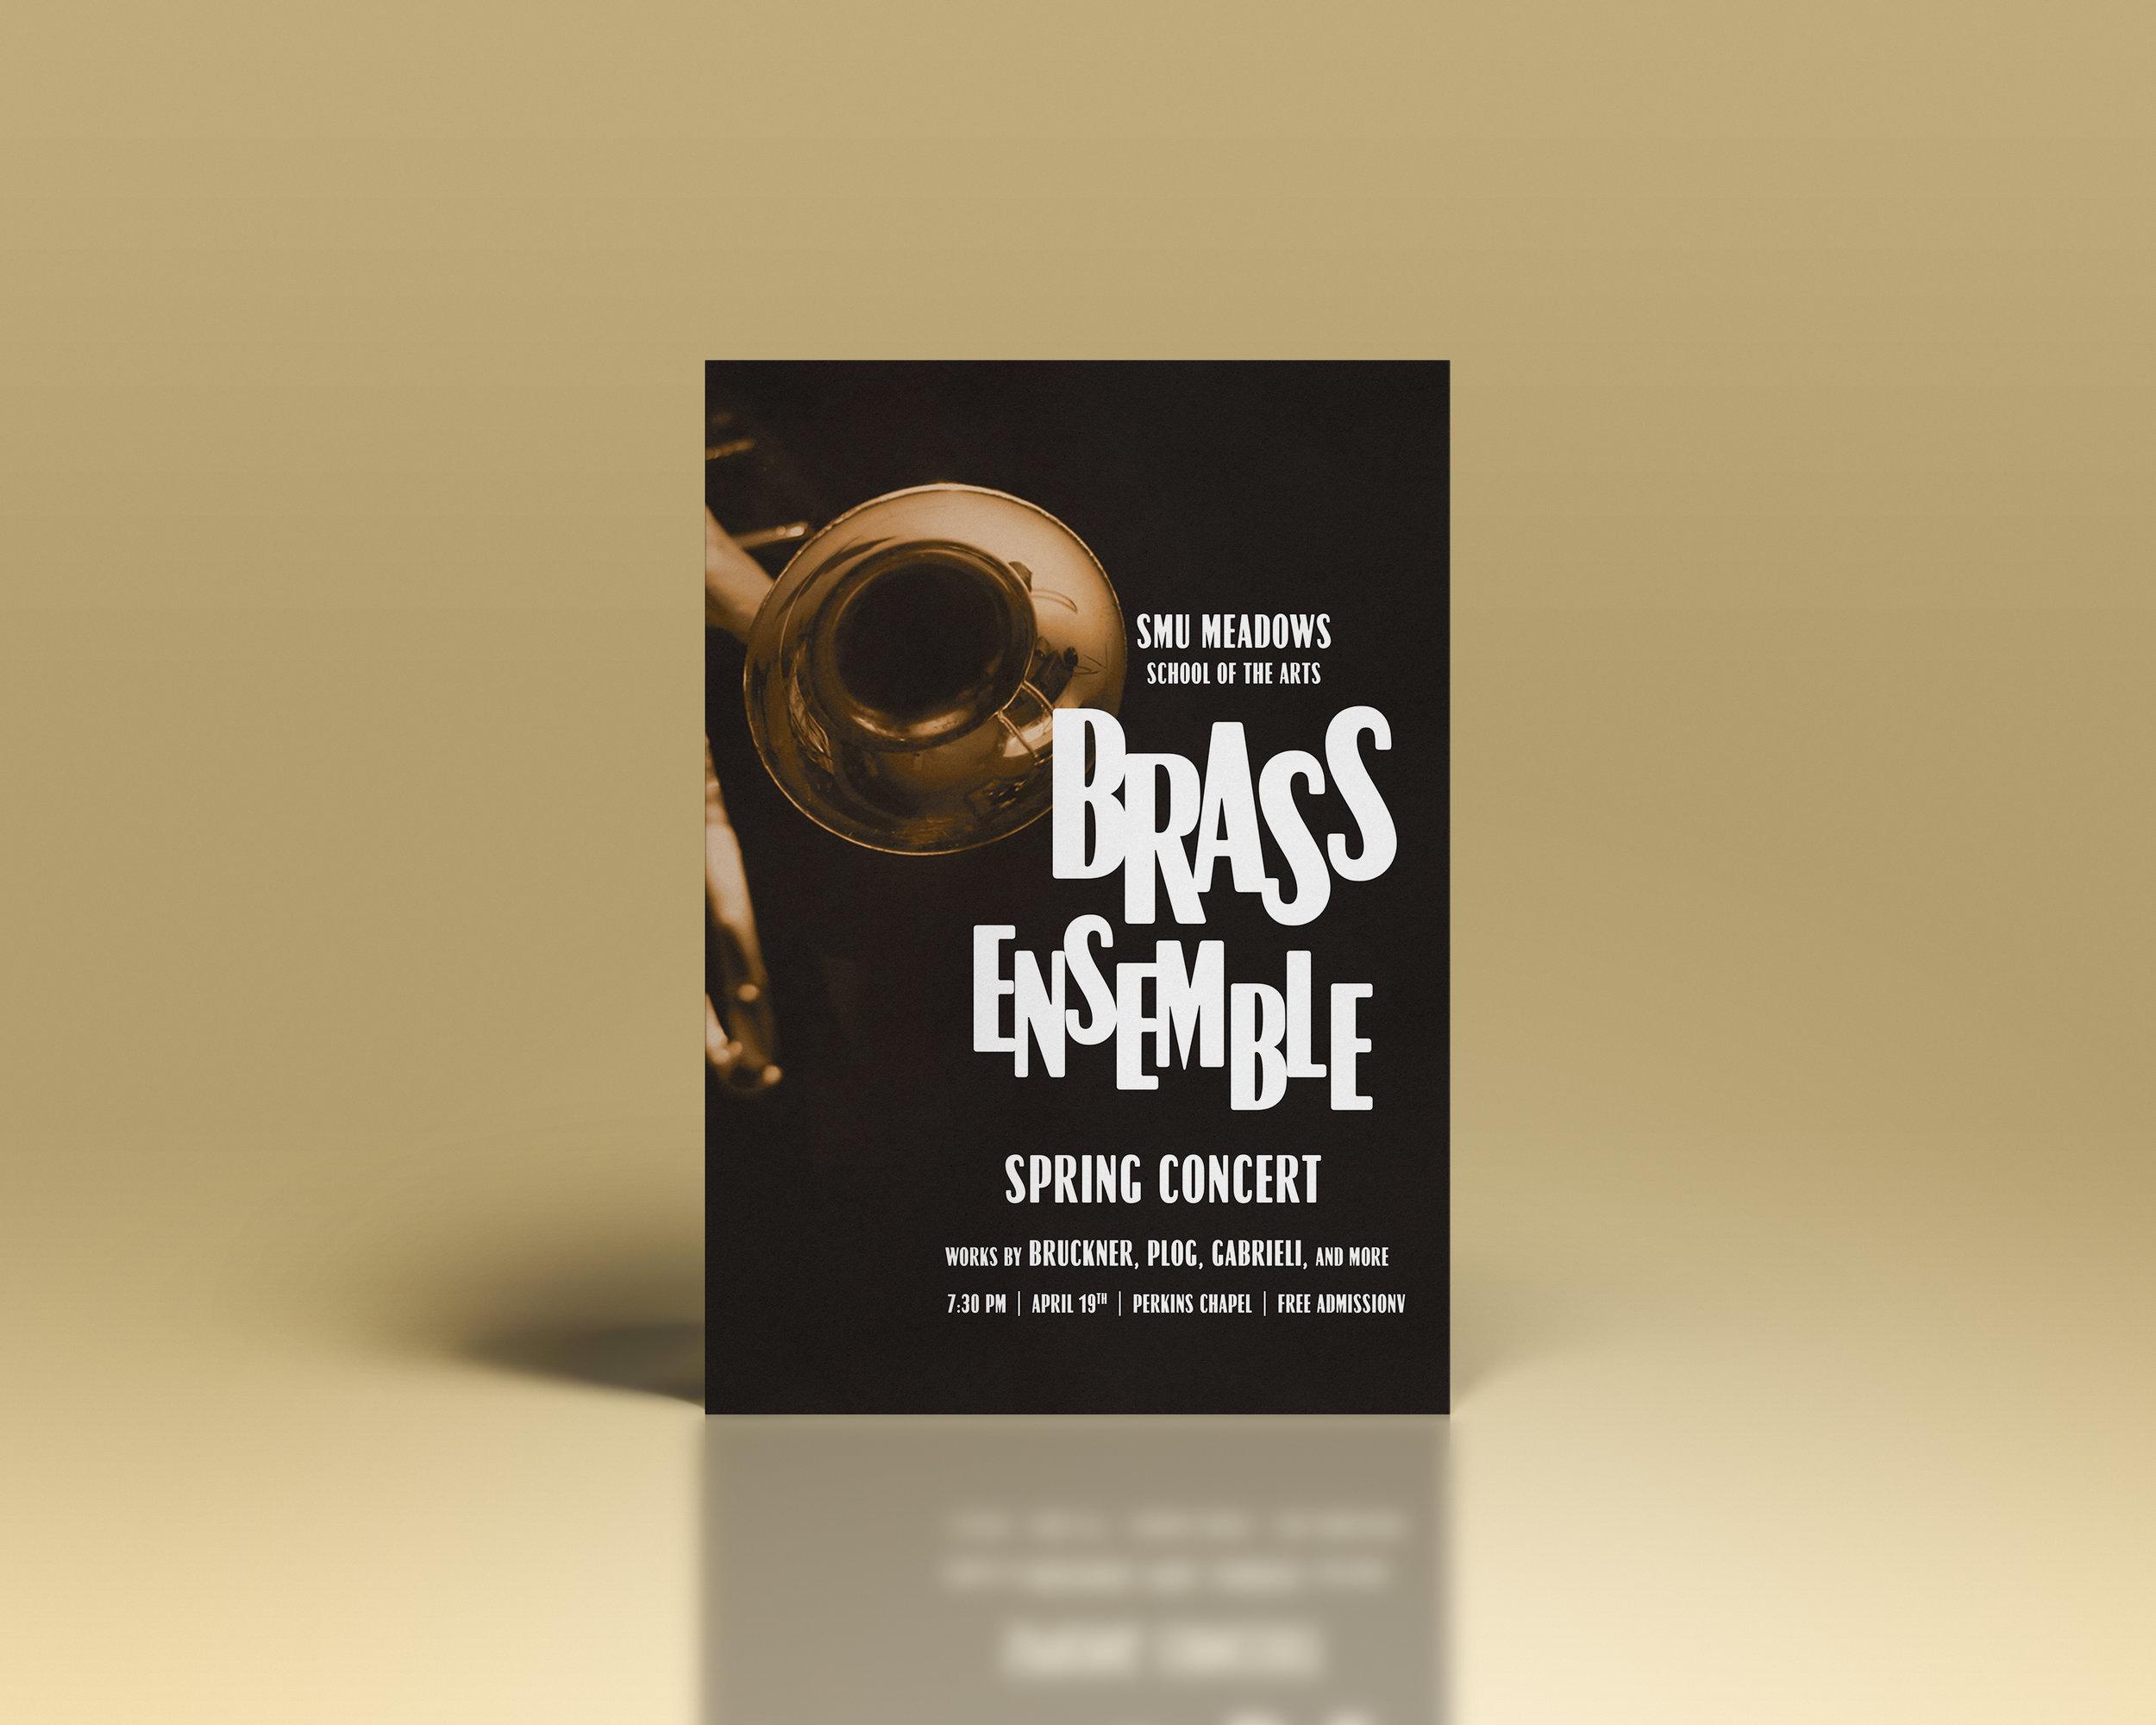 Brass Ensemble Spring Concert